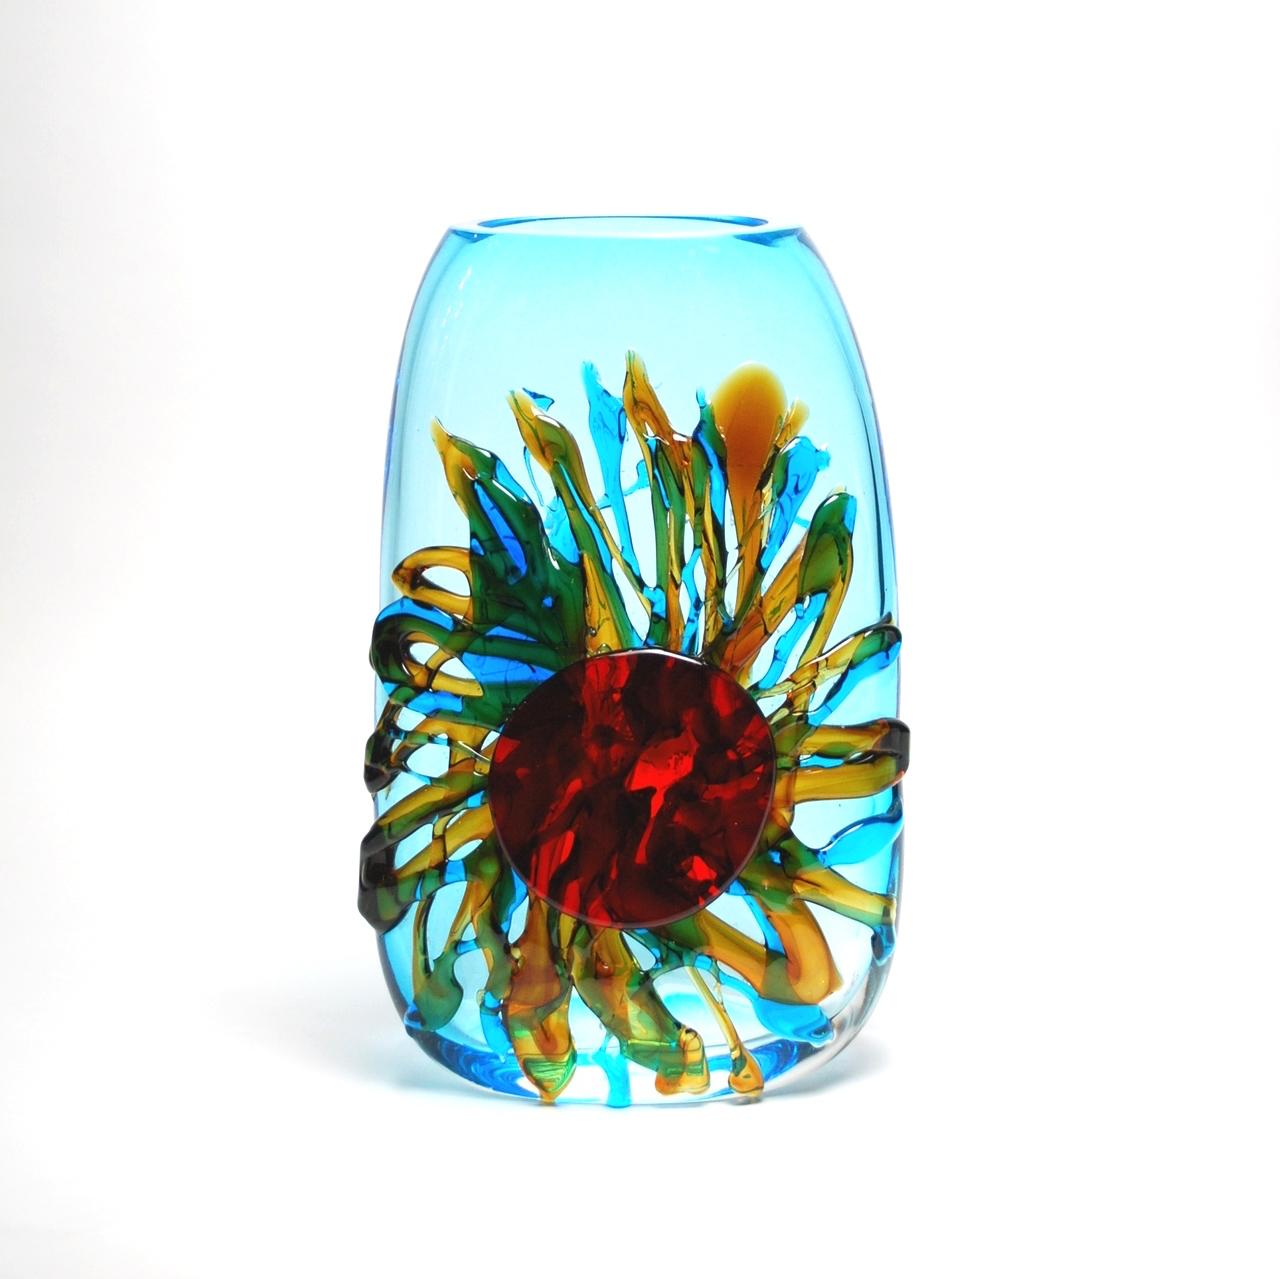 Murano Tall Sun Vase   8x4x17h  MB19141